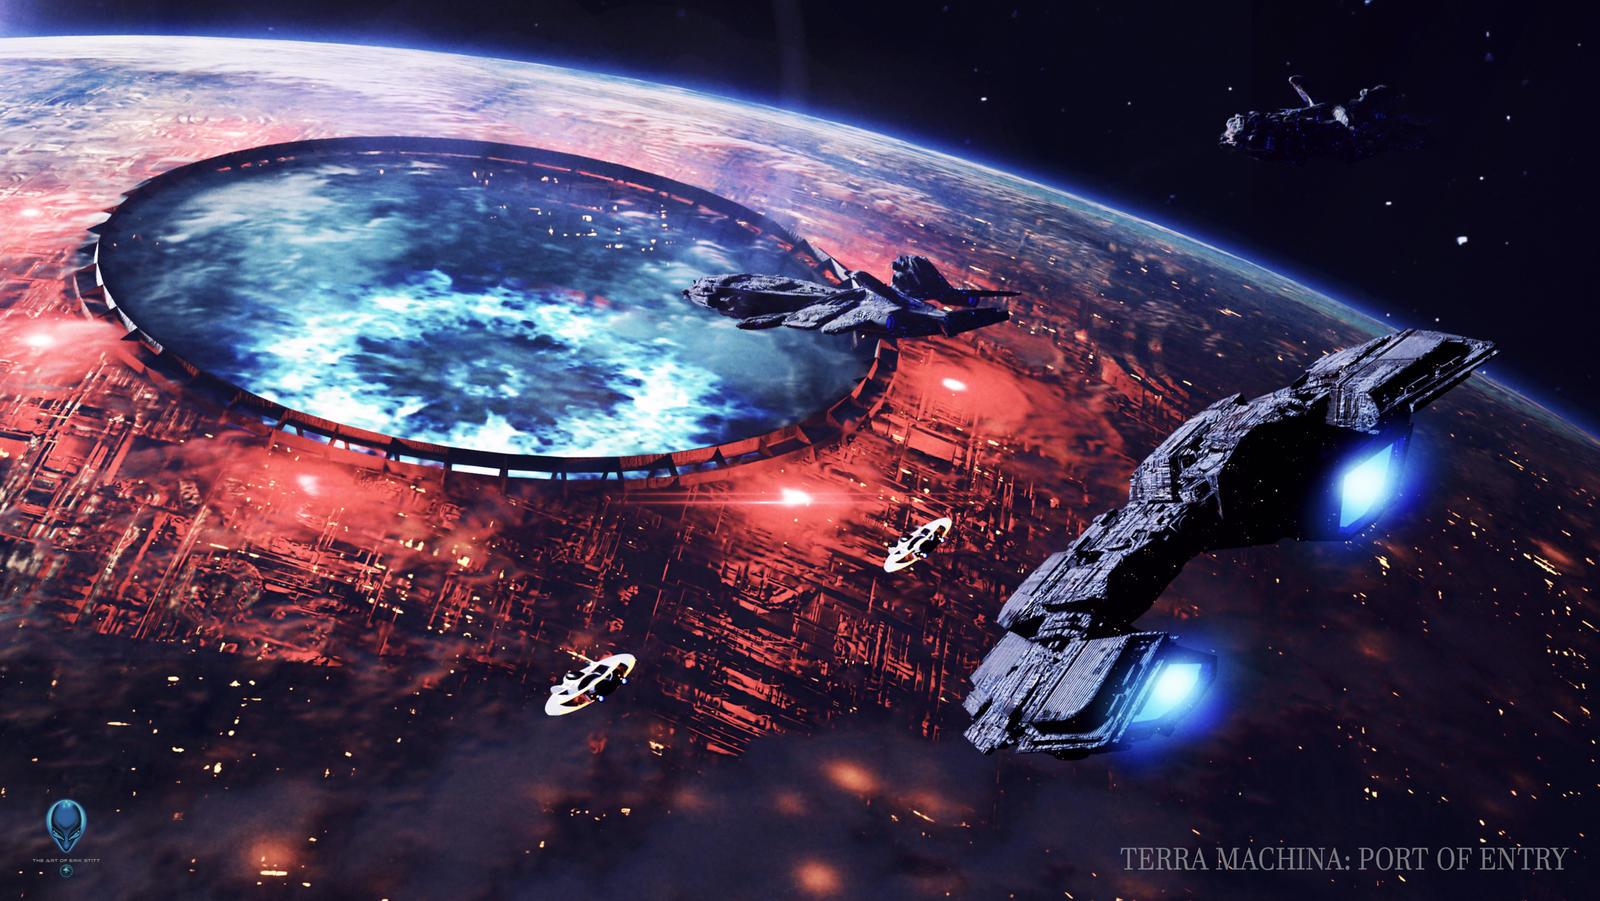 Terra Machina: Port of Entry